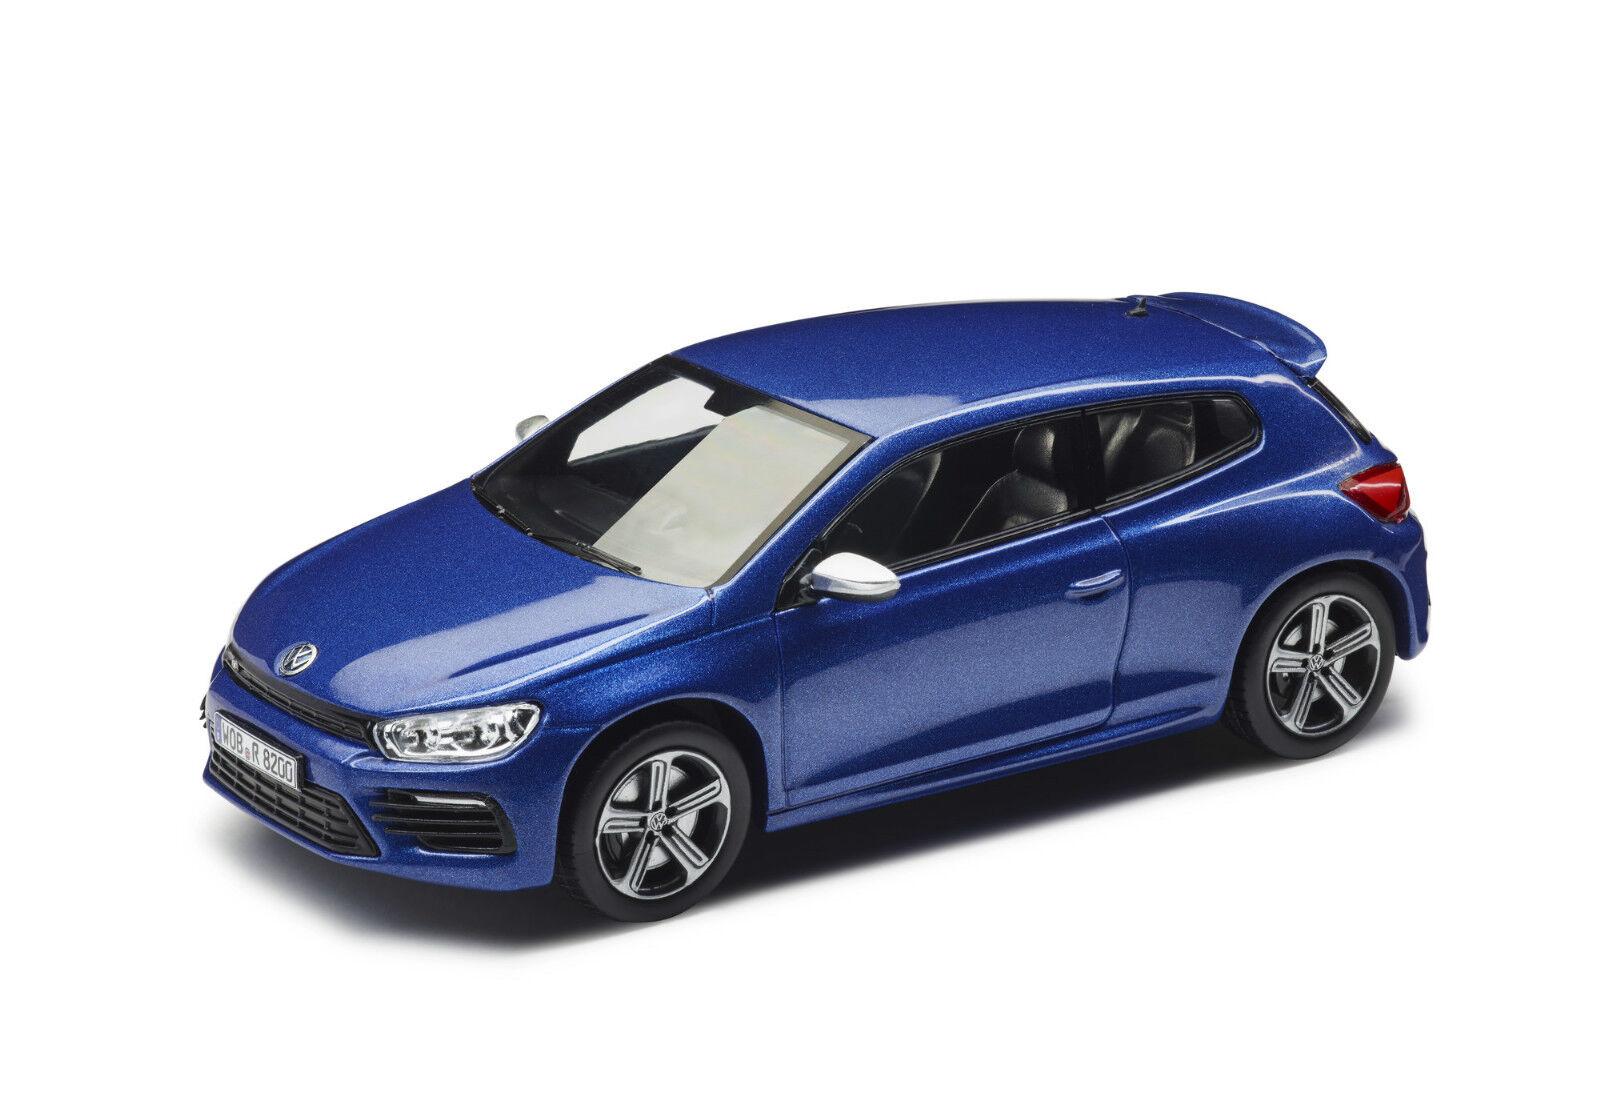 Original VW Model Car 1 43, SCIROCCO R, Rising bluee Metallic